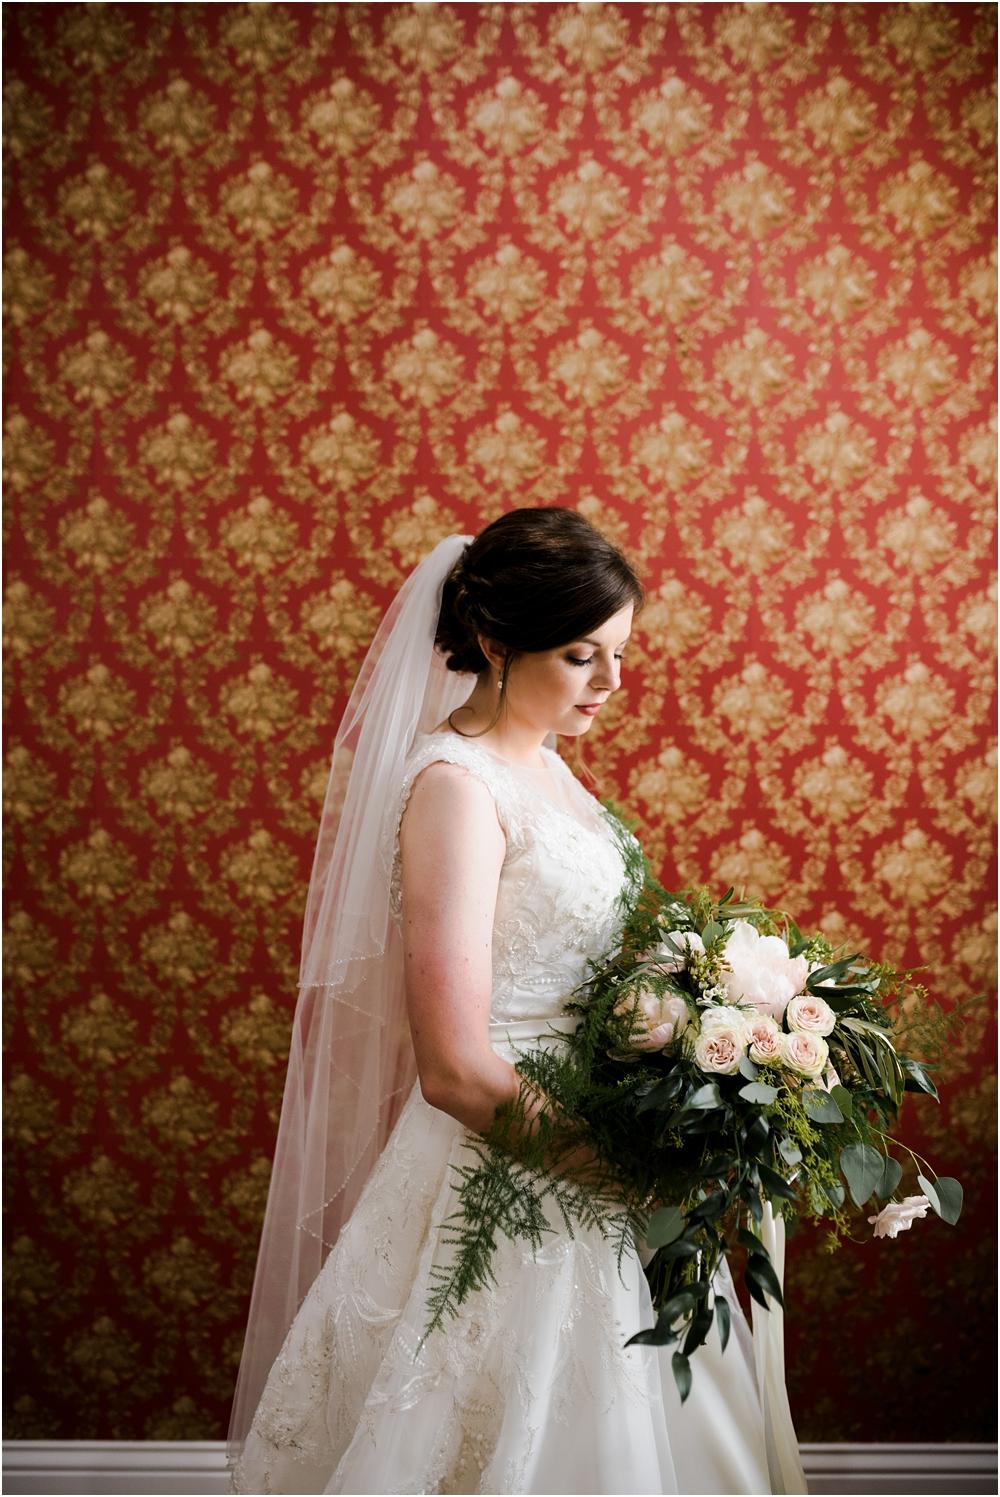 marianna-florida-wedding-photographer-kiersten-grant-33.jpg